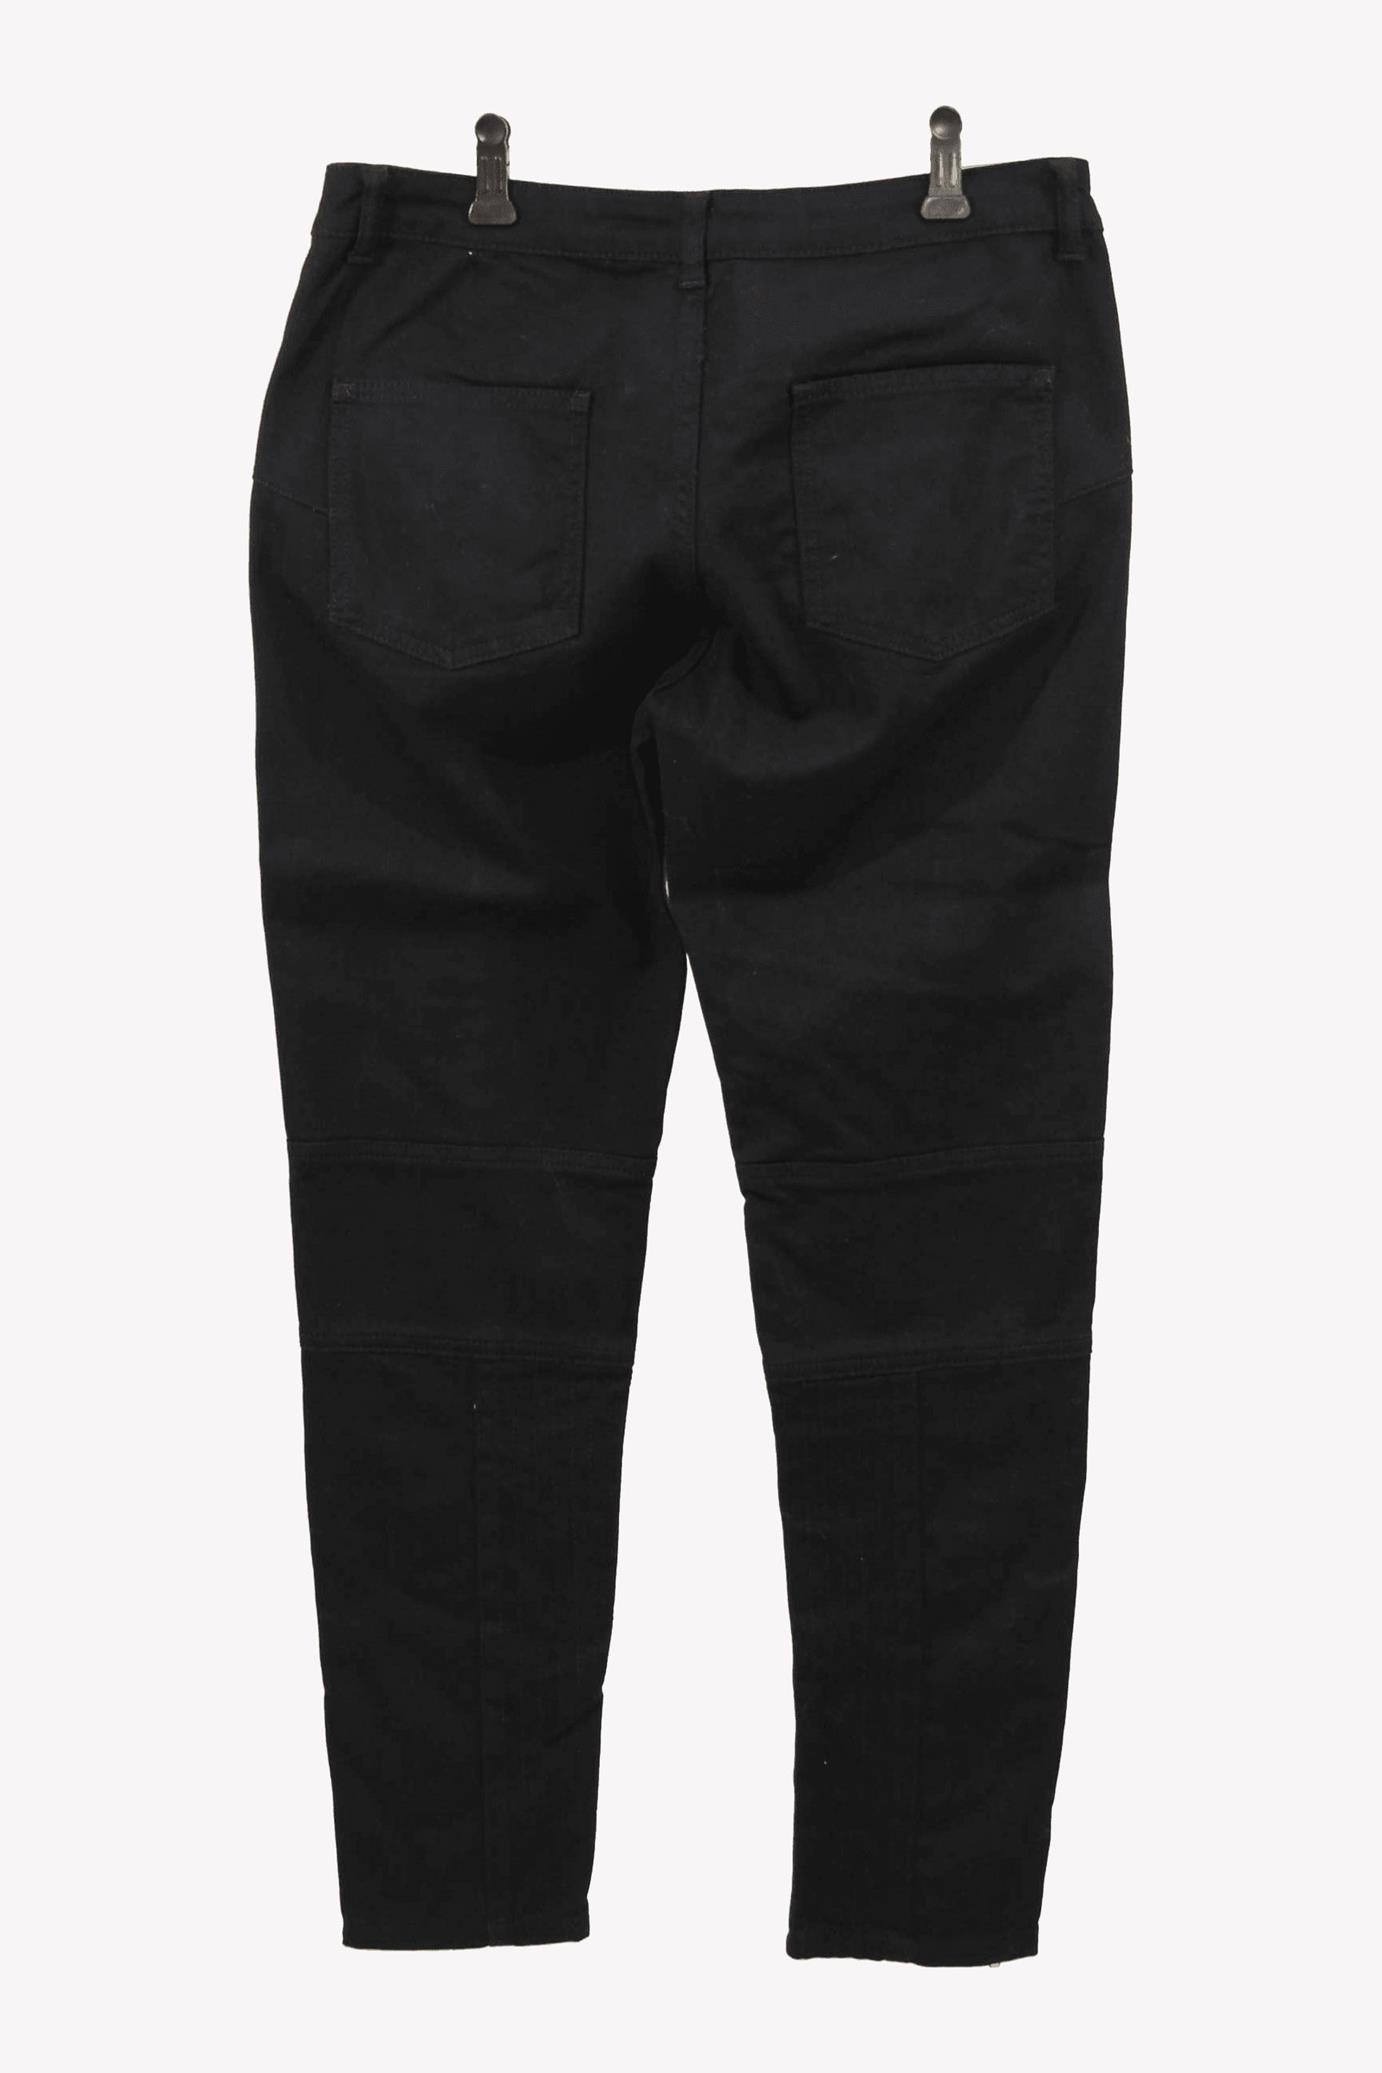 Jeanshose in Schwarz Whistles